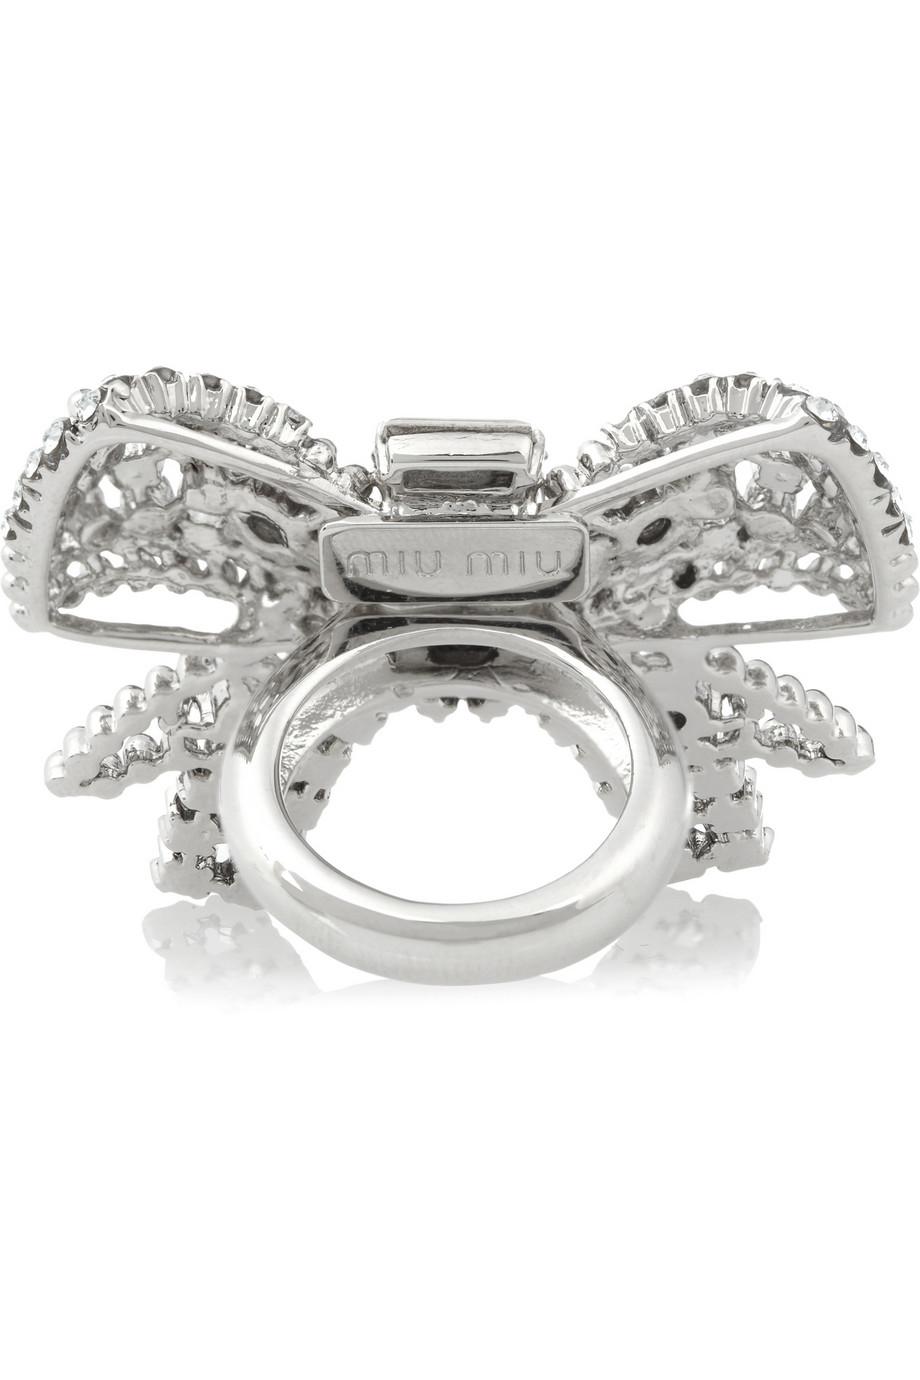 Miu Miu Silver-Plated Swarovski Crystal Bow Ring in Blue